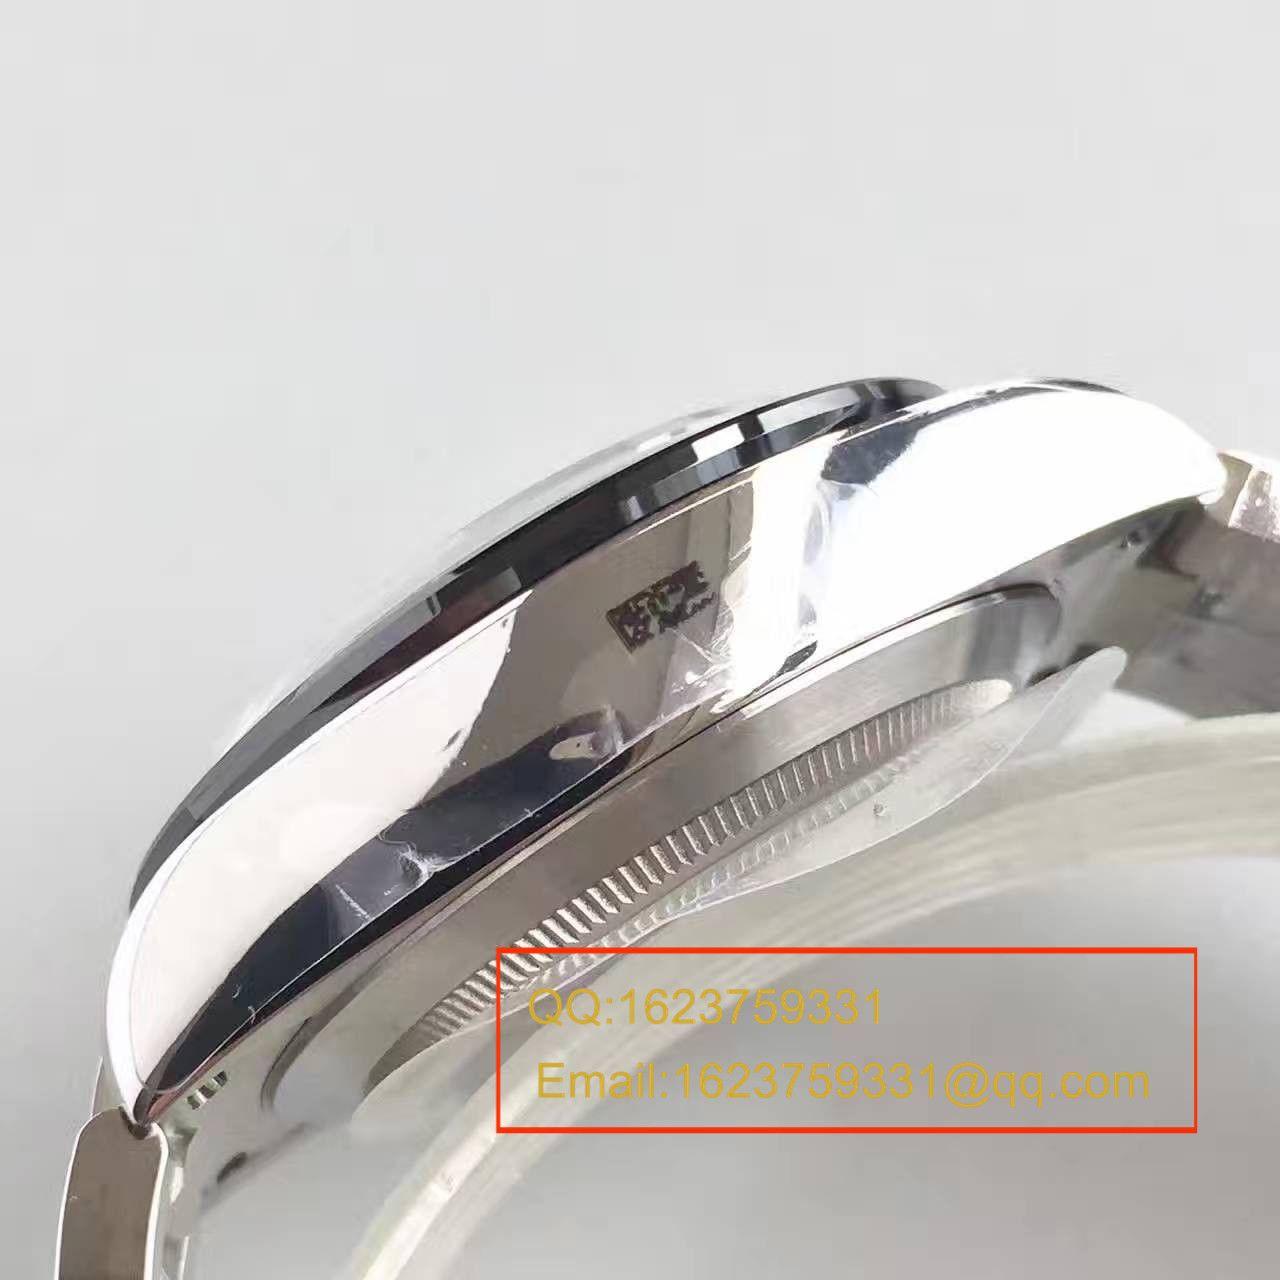 【JF厂超A1:1高仿】劳力士宇宙计型迪通拿系列116500LN-78590黑盘机械手表 / RBD015